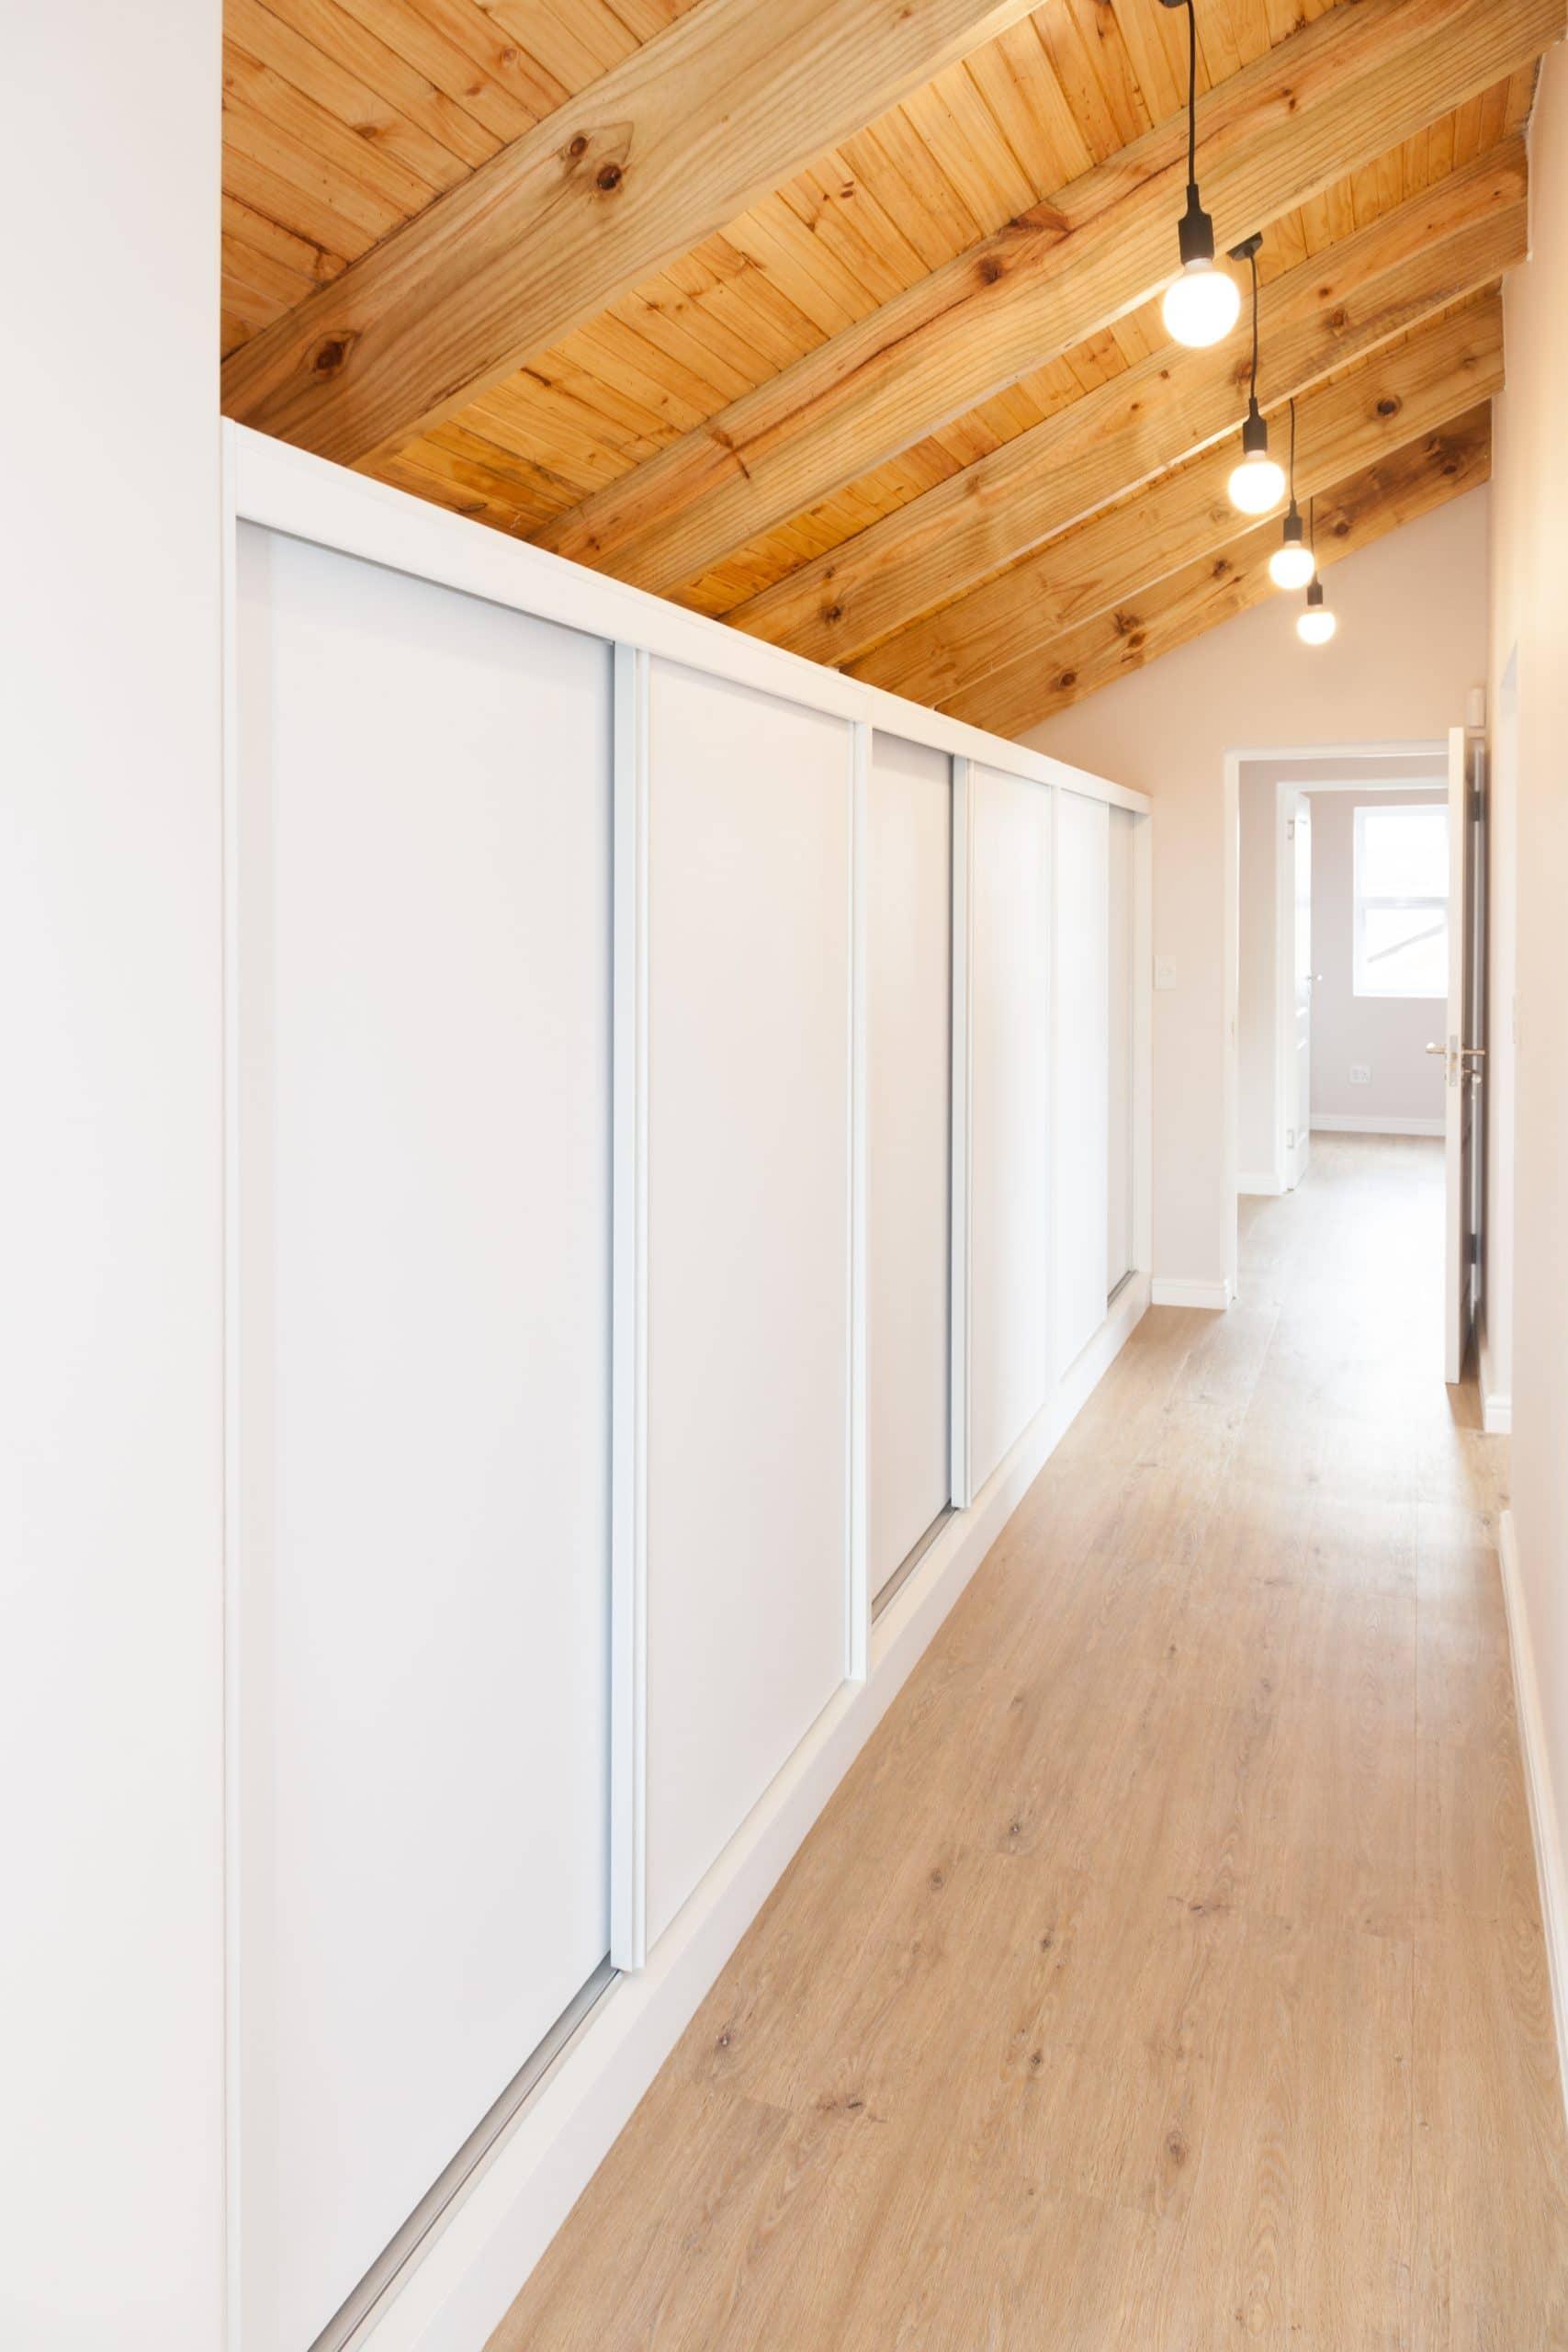 open trusses loft bedroom sliding cupboards wood flooring